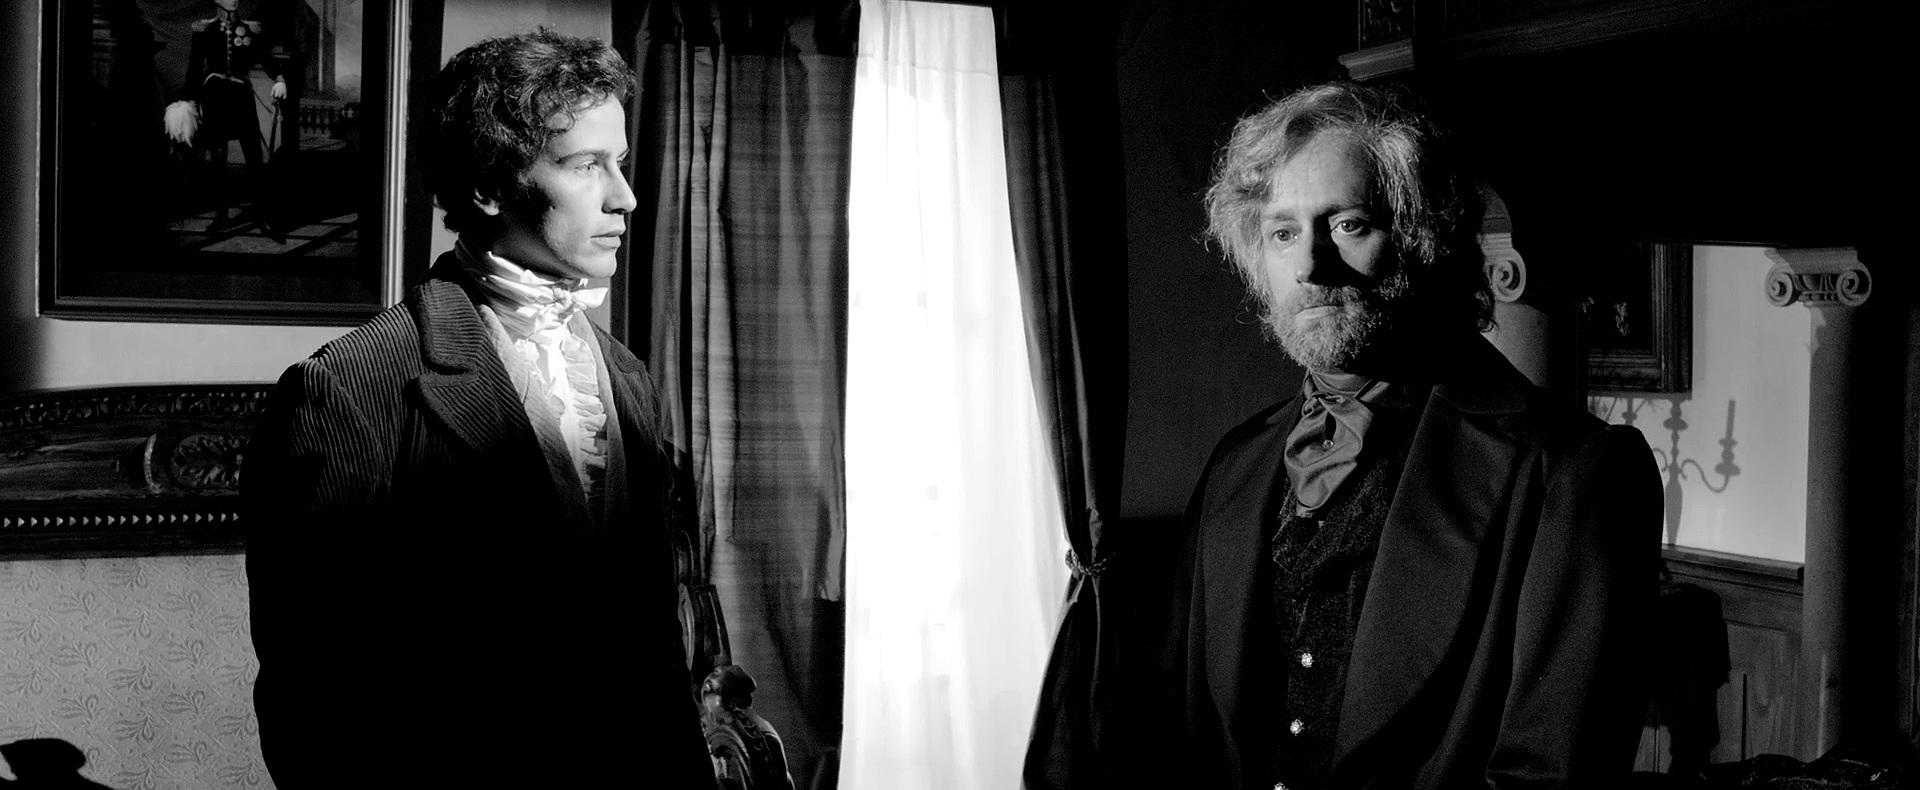 Nuno Casanovas and Nuno Pardal in Os Maias: Cenas da Vida Romântica (2014)